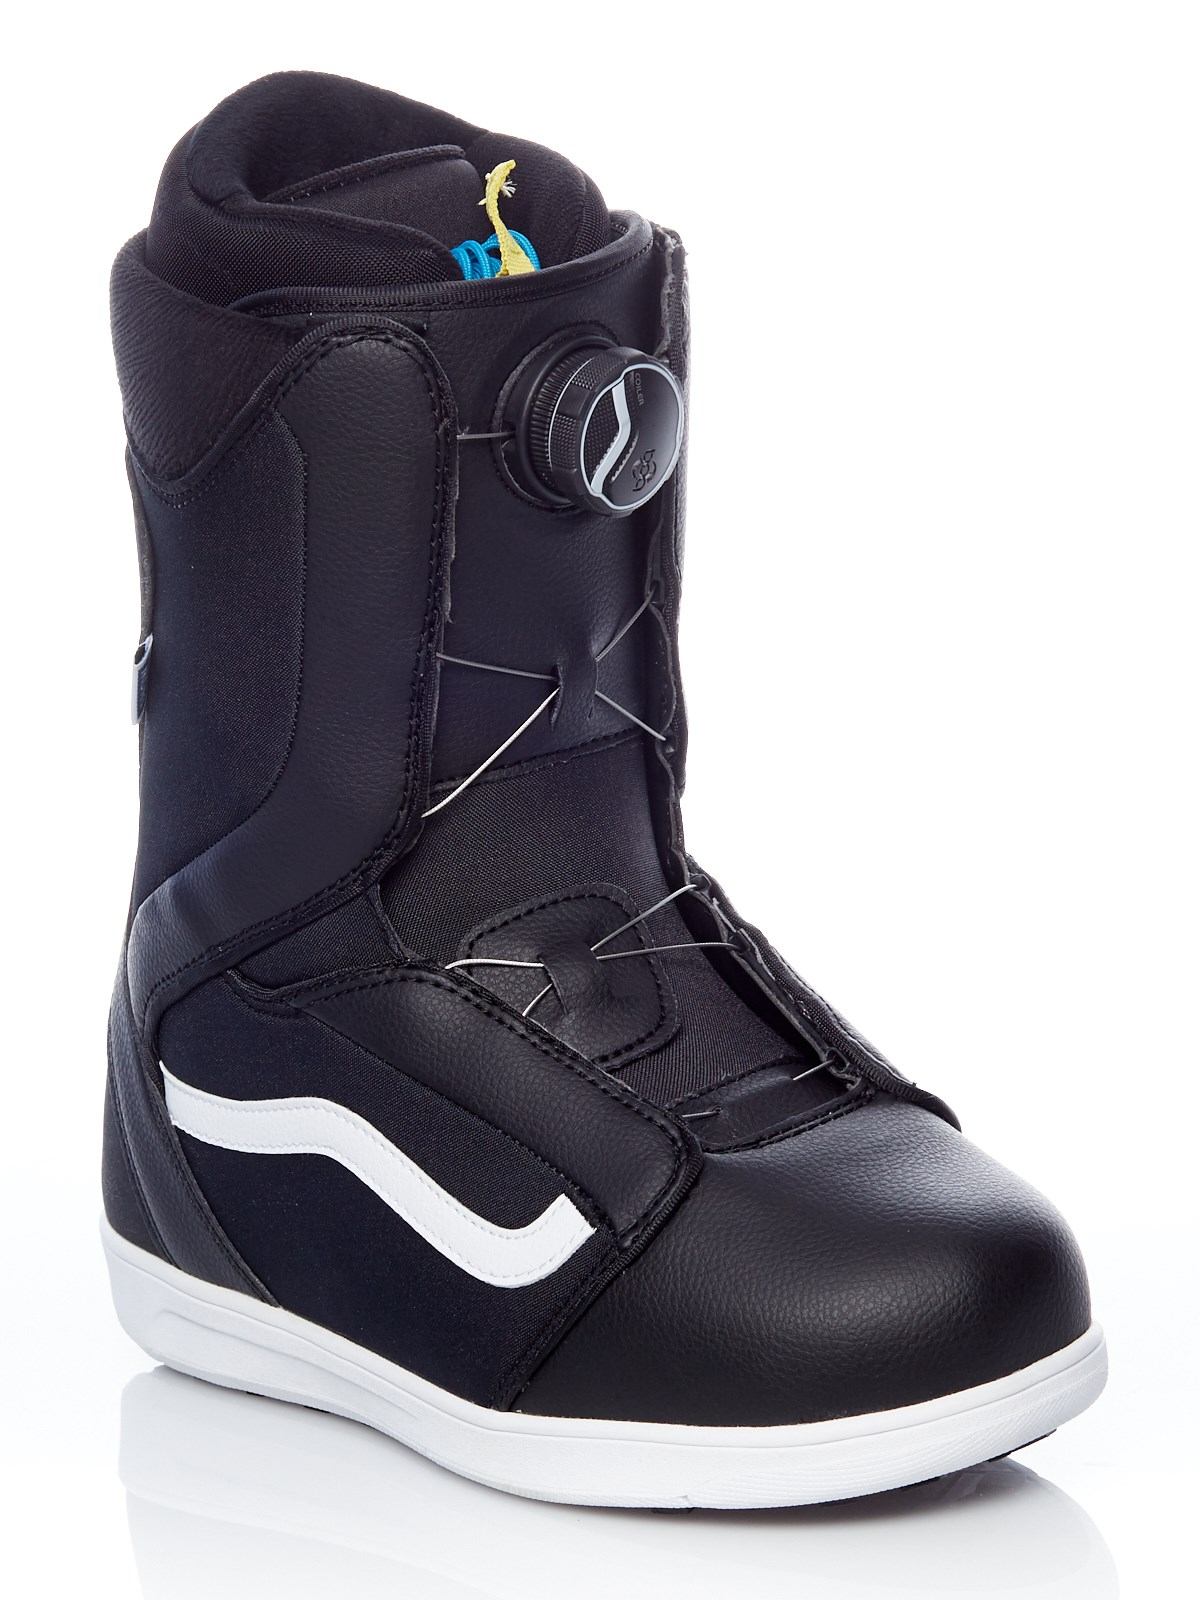 bottes snowboard